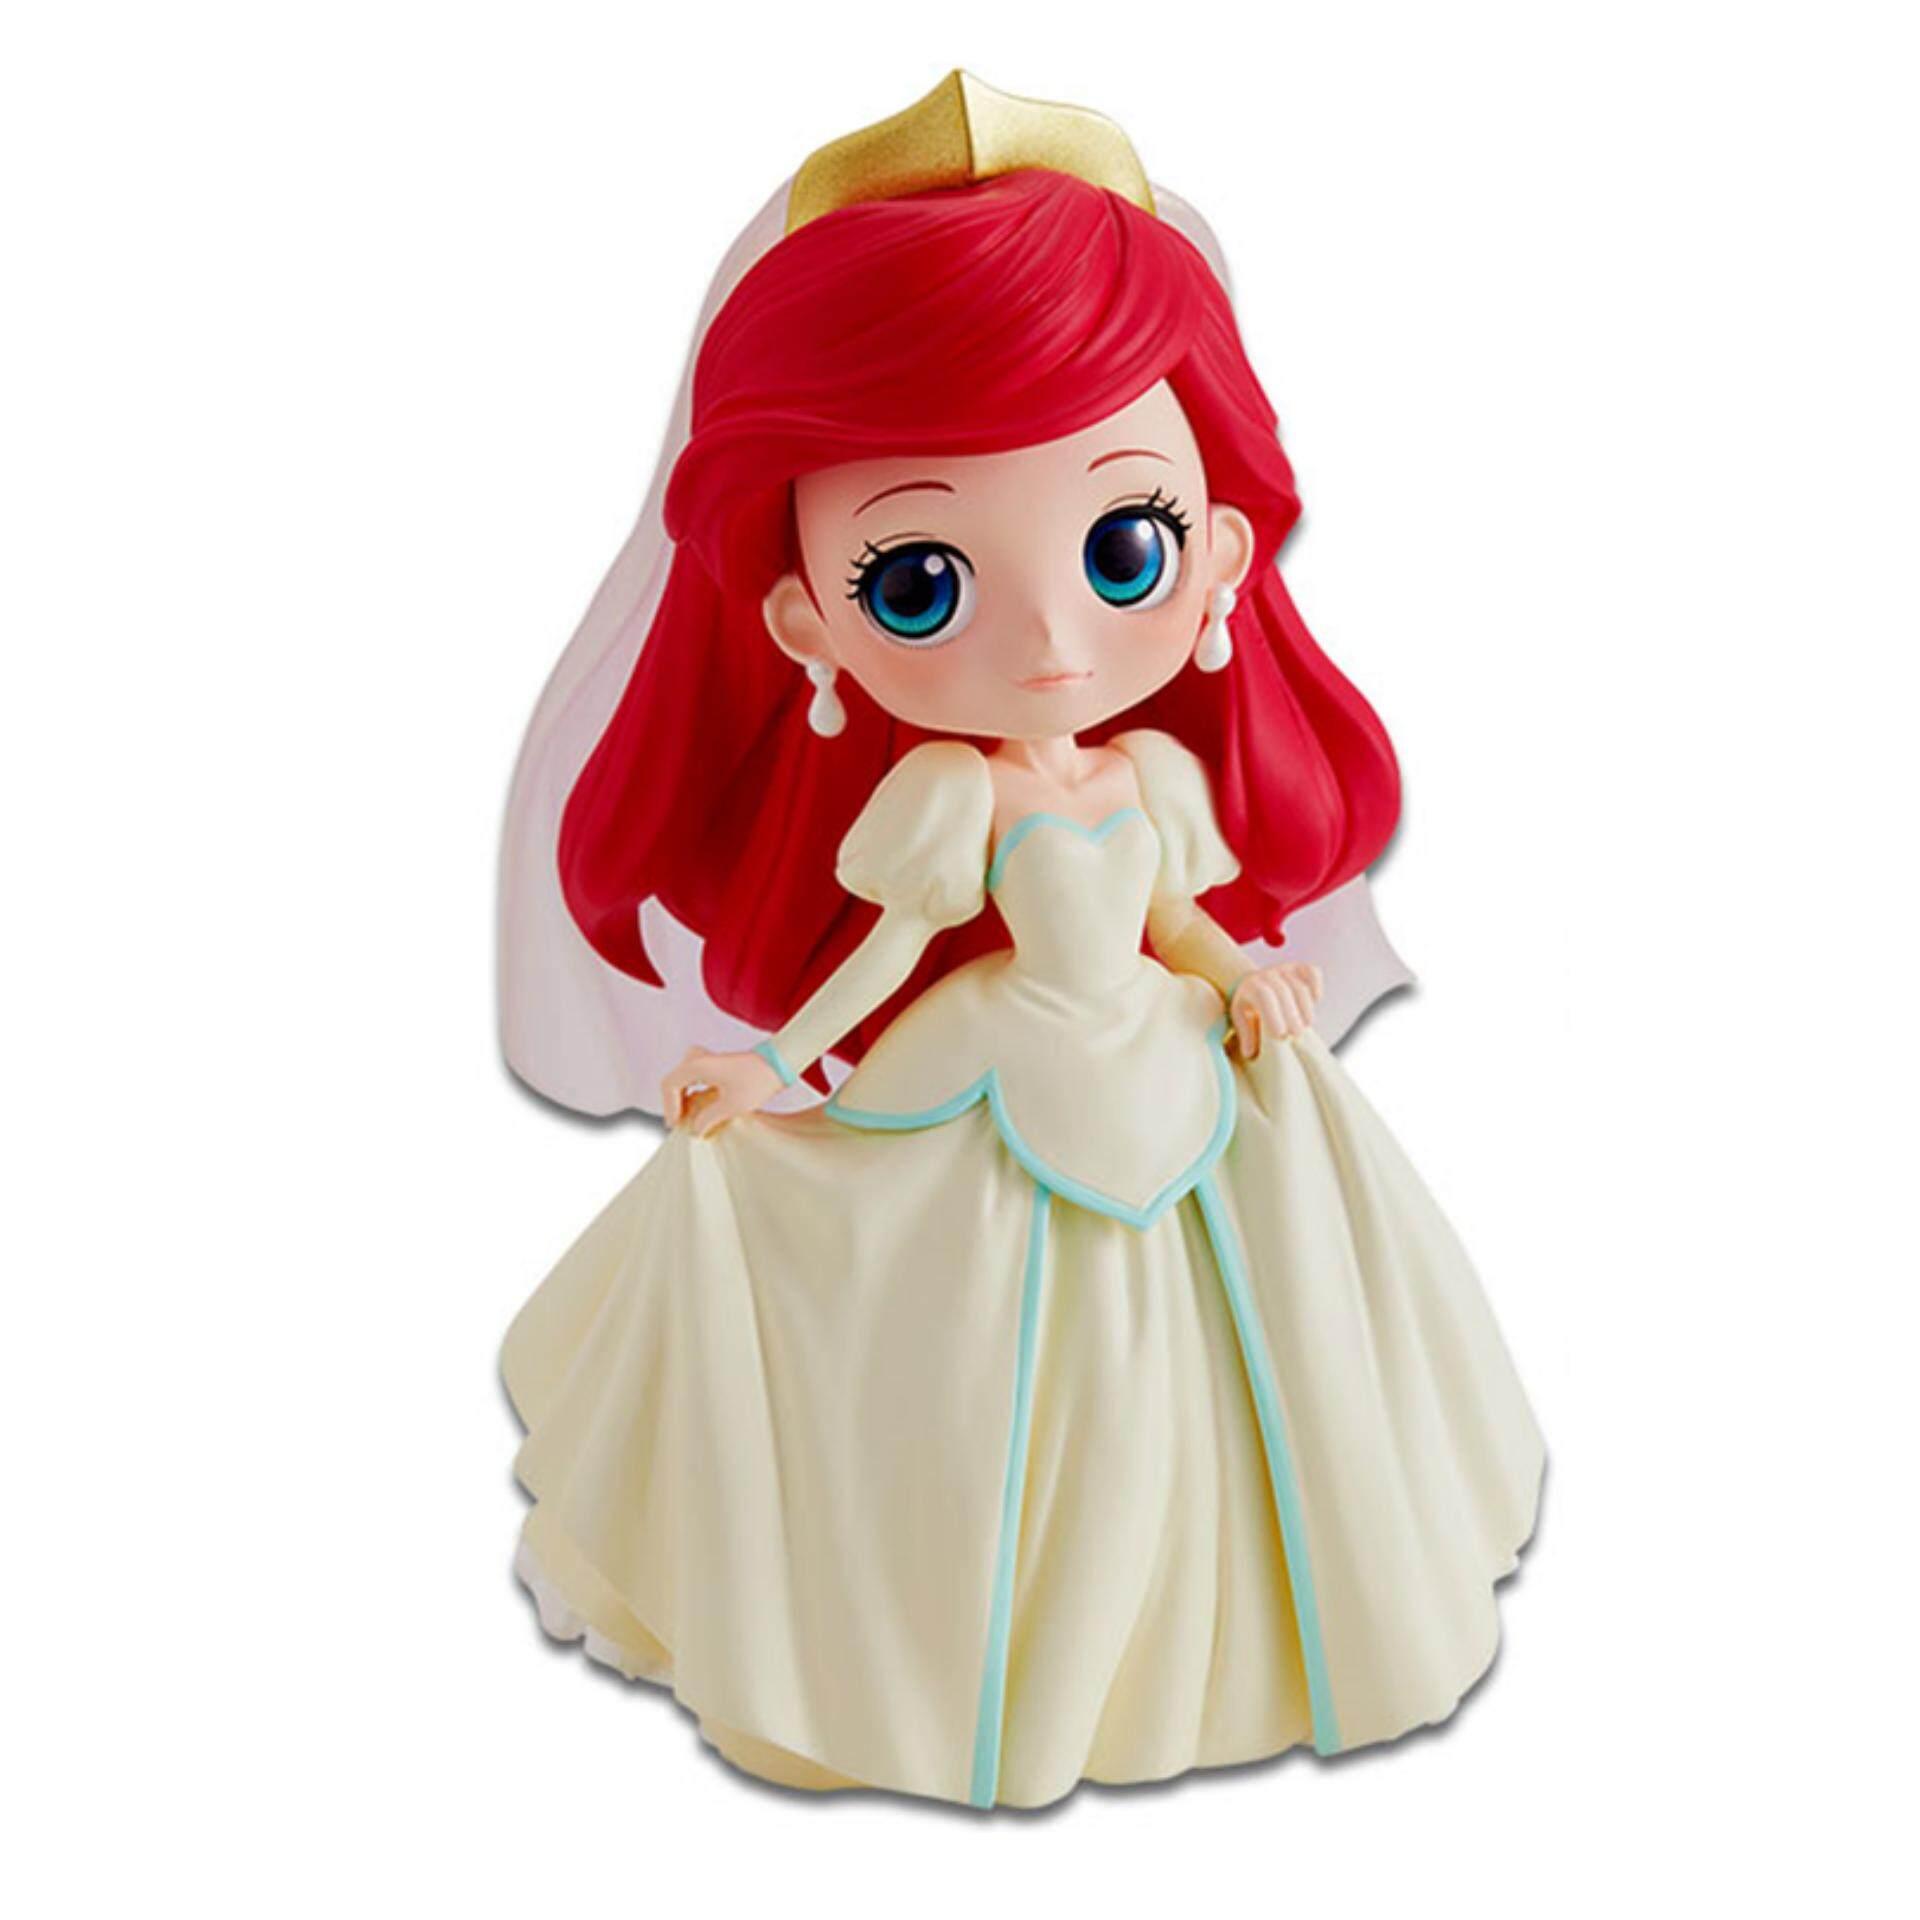 Banpresto Q Posket Disney Princess Figure Normal Version - Ariel Dreamy Style Toys for boys